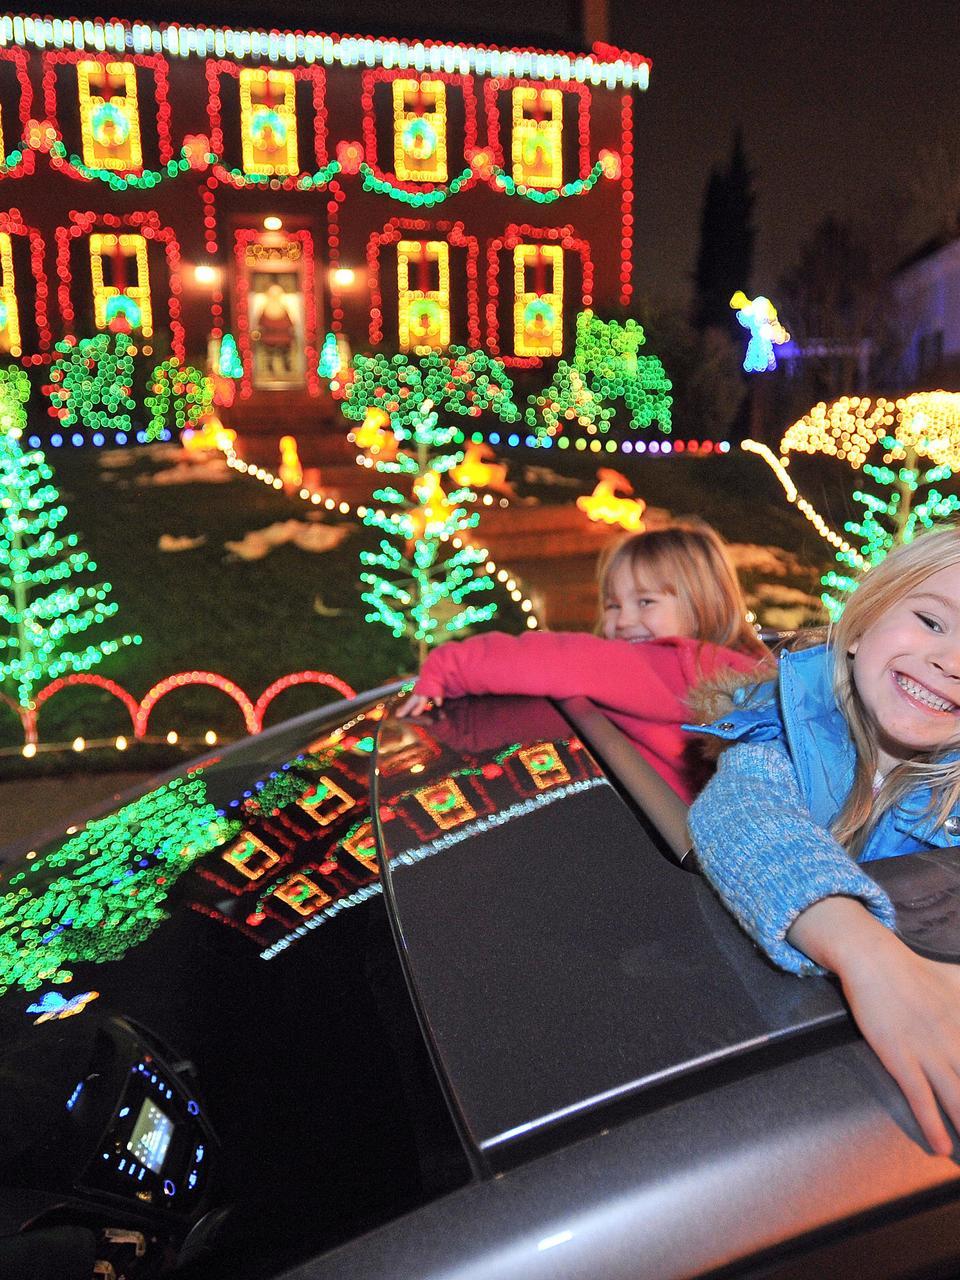 Holiday lights worth seeing | Mail Tribune